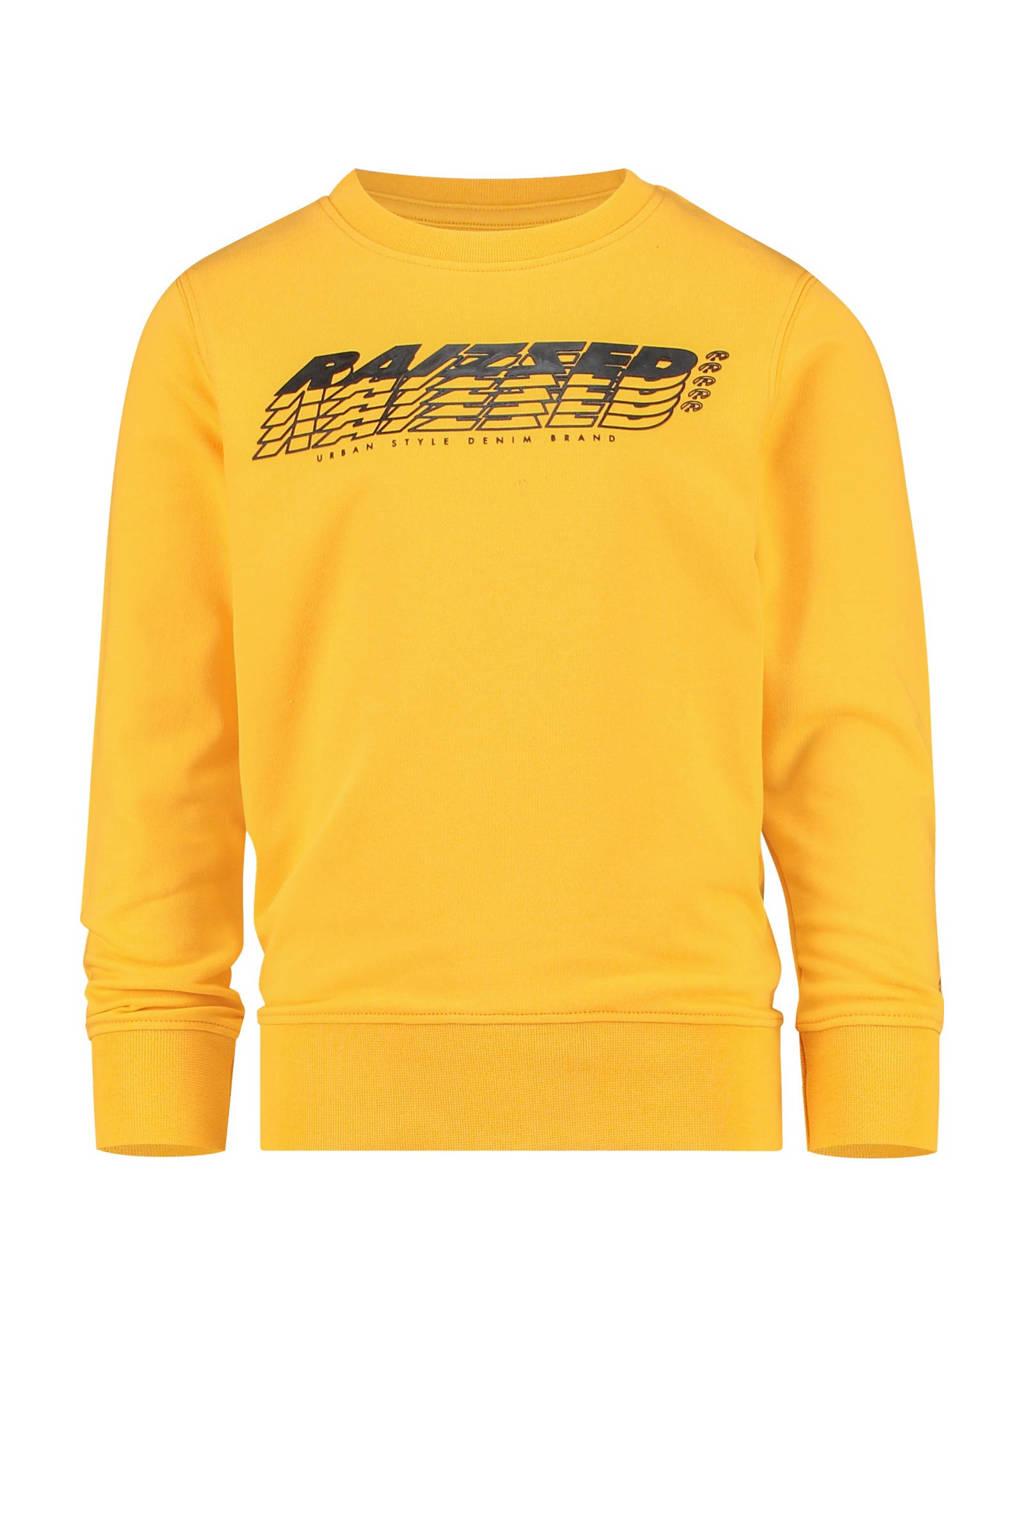 Raizzed sweater Nagahama met logo honinggeel, Honinggeel